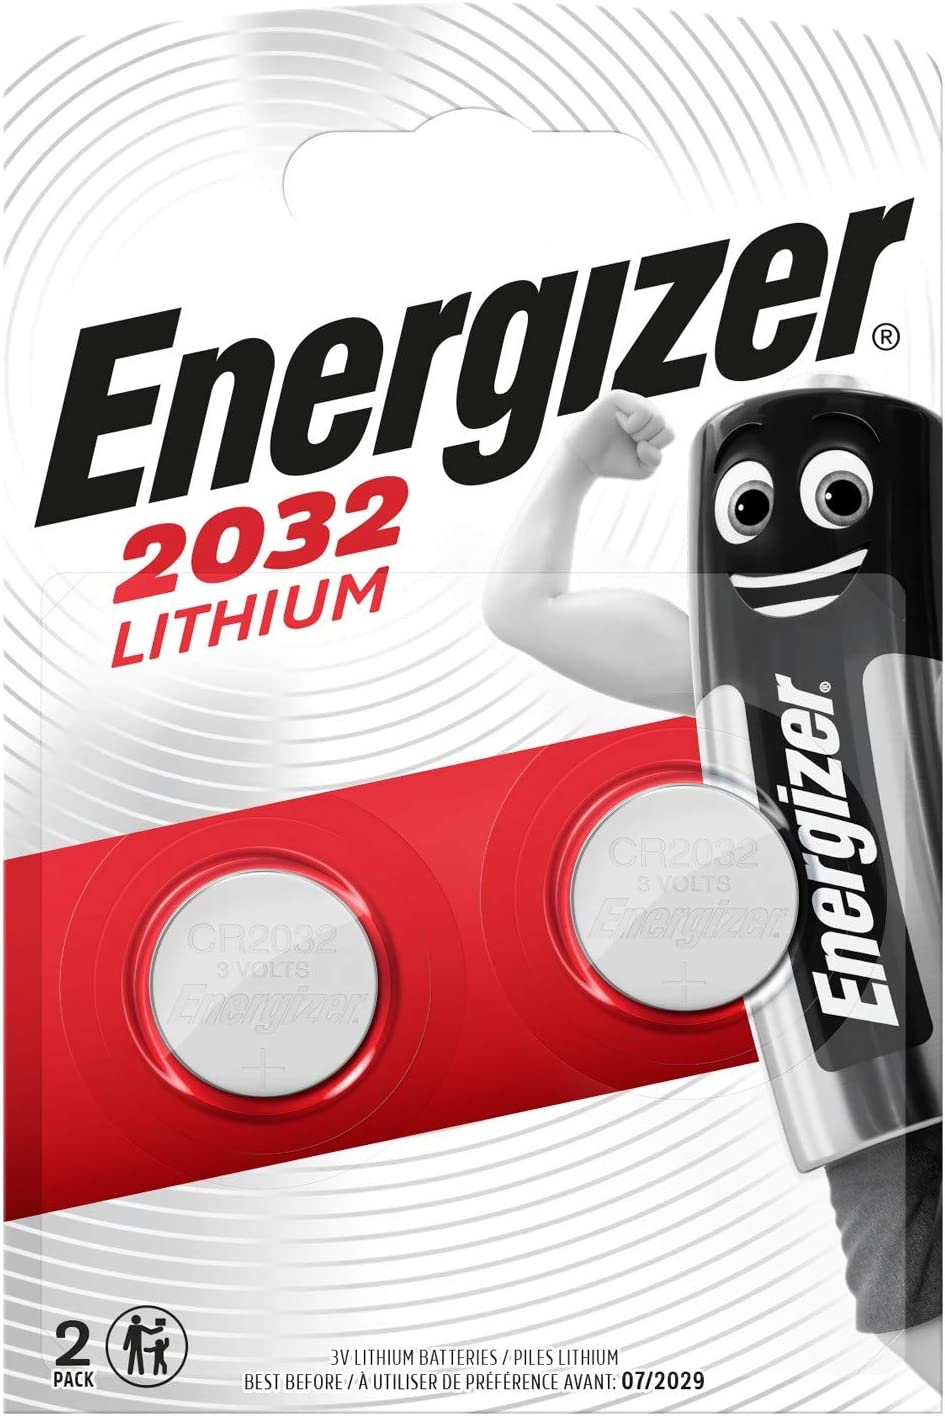 Energizer Cr2032 Batterien Lithium Knopfzelle 2 Stück Elektronik